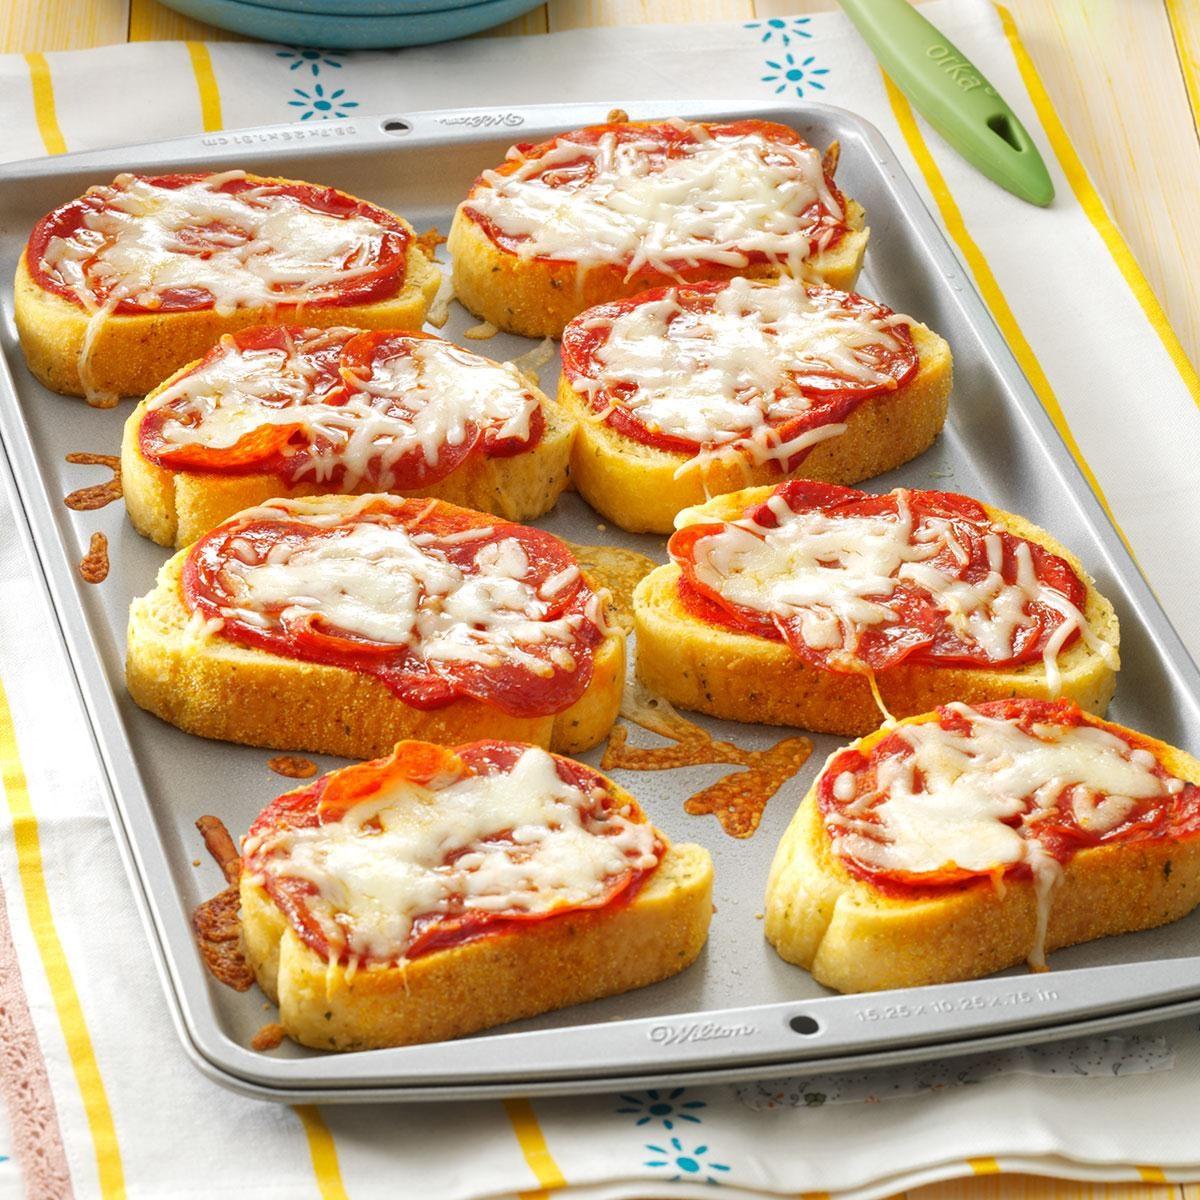 Middle School Age: Garlic Toast Pizzas